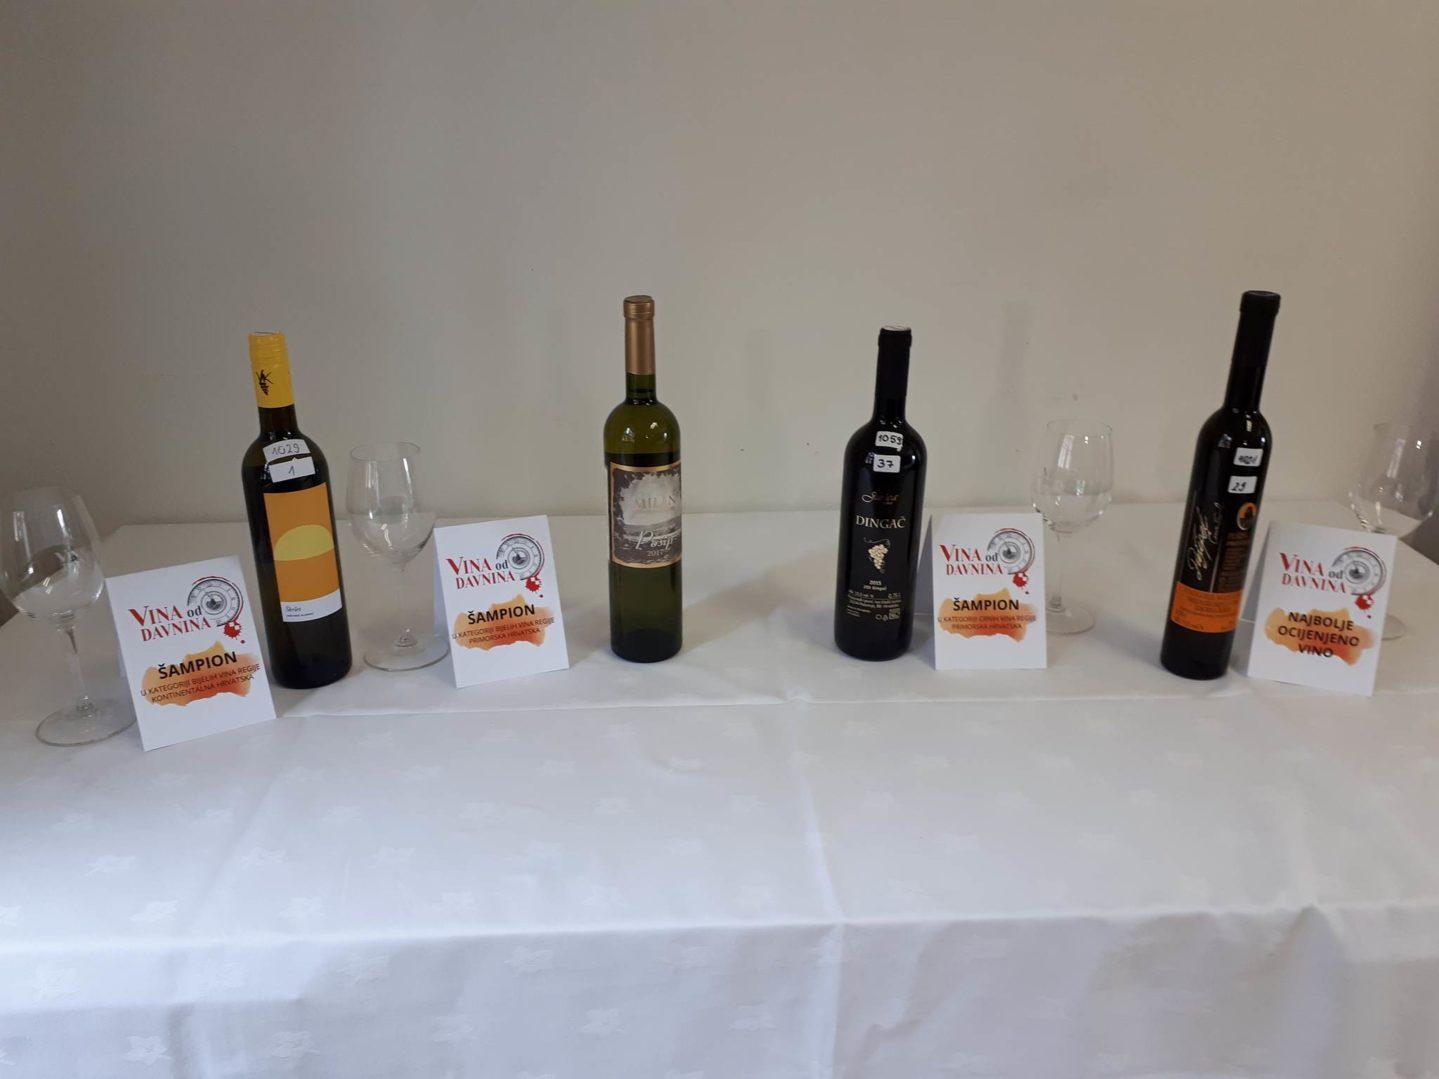 vina od davnina (2)